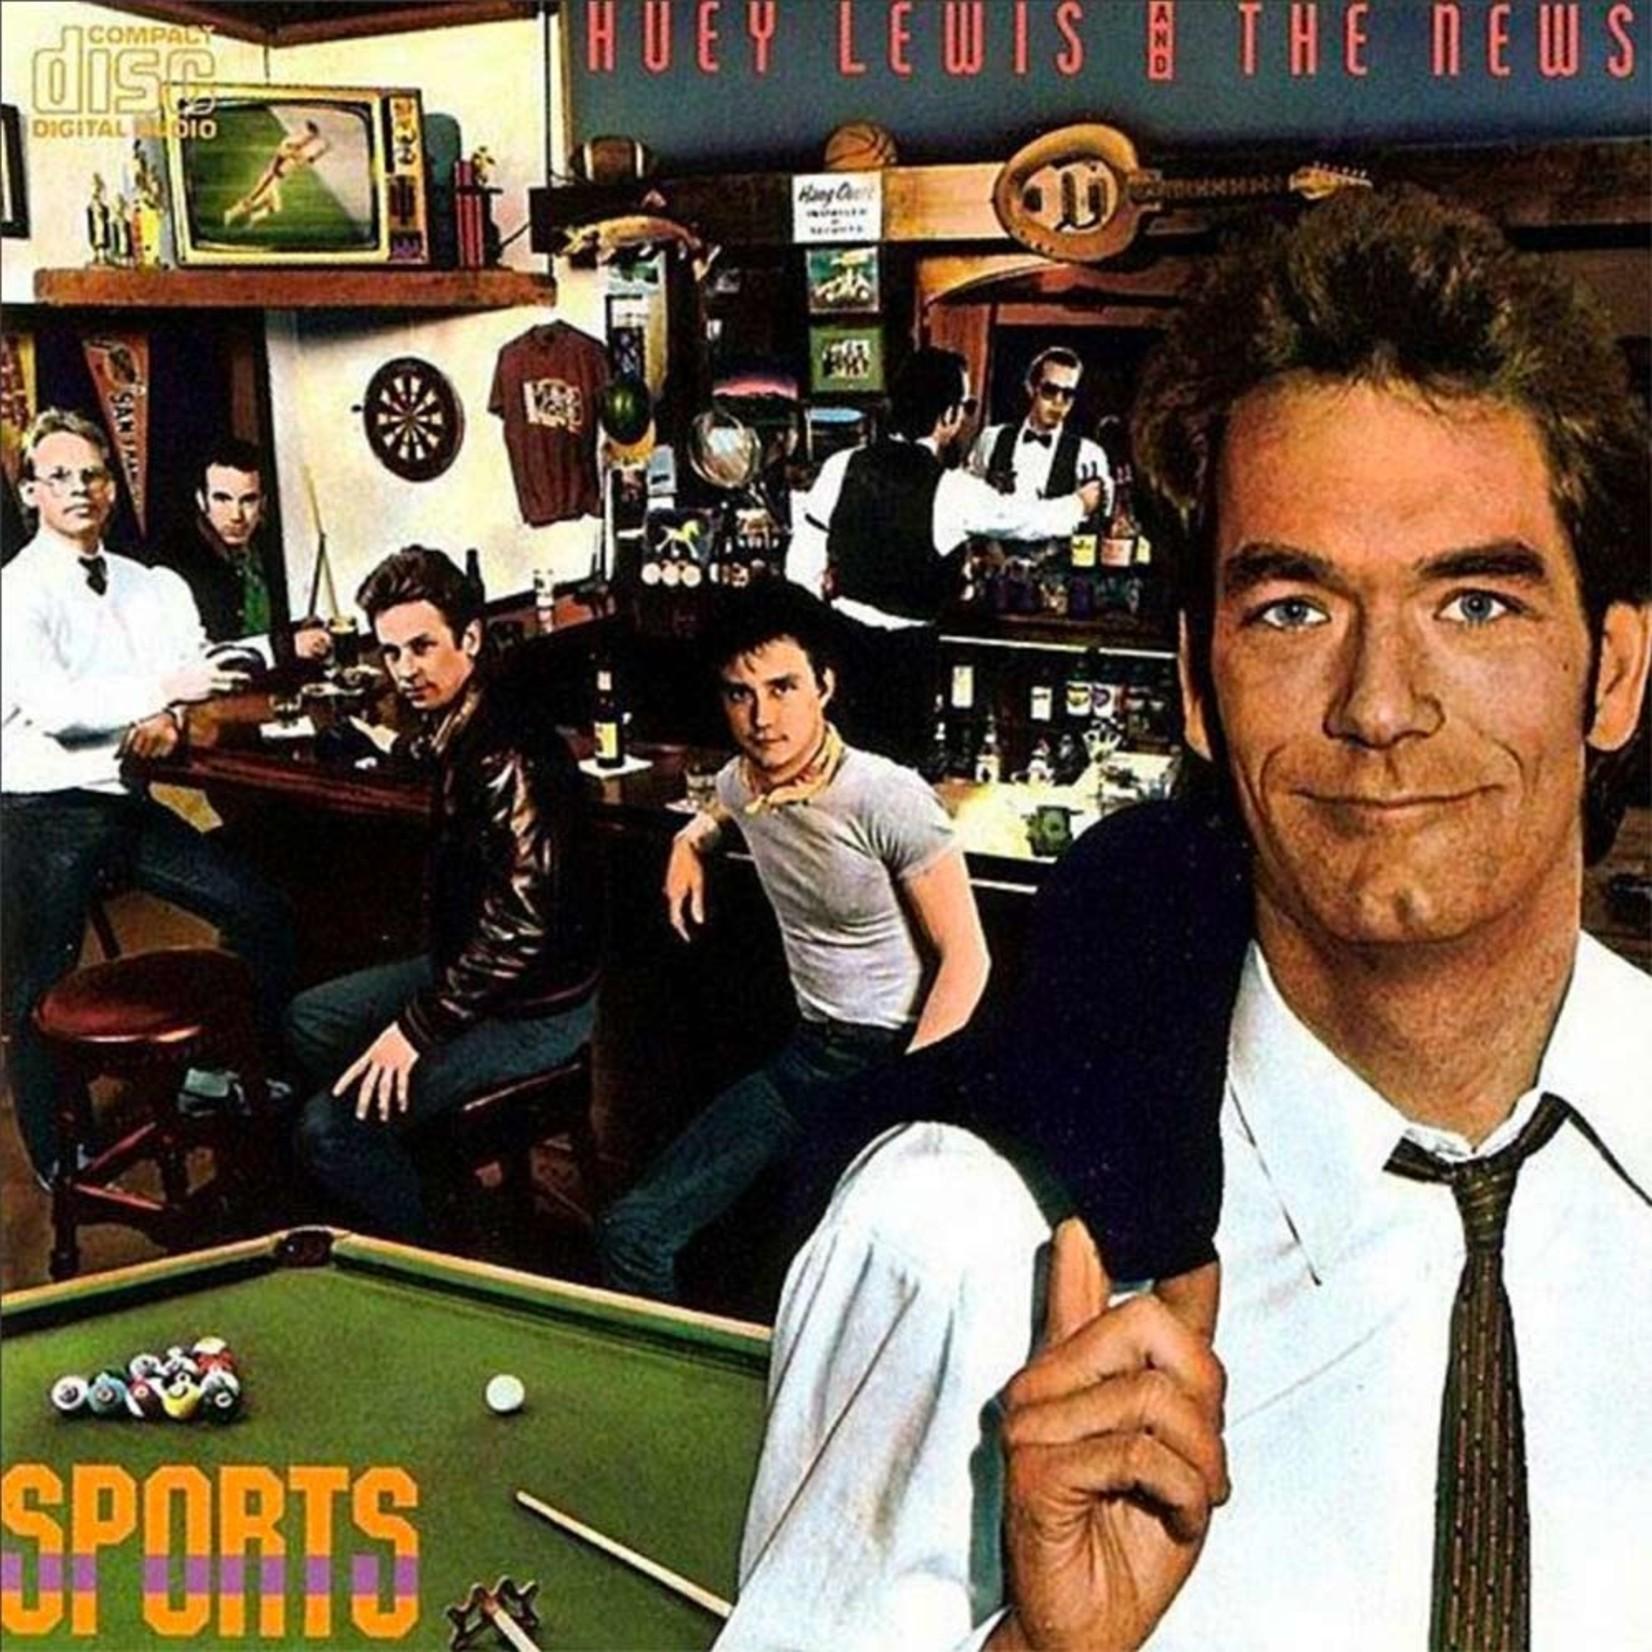 [Vintage] Lewis, Huey & the News: Sports